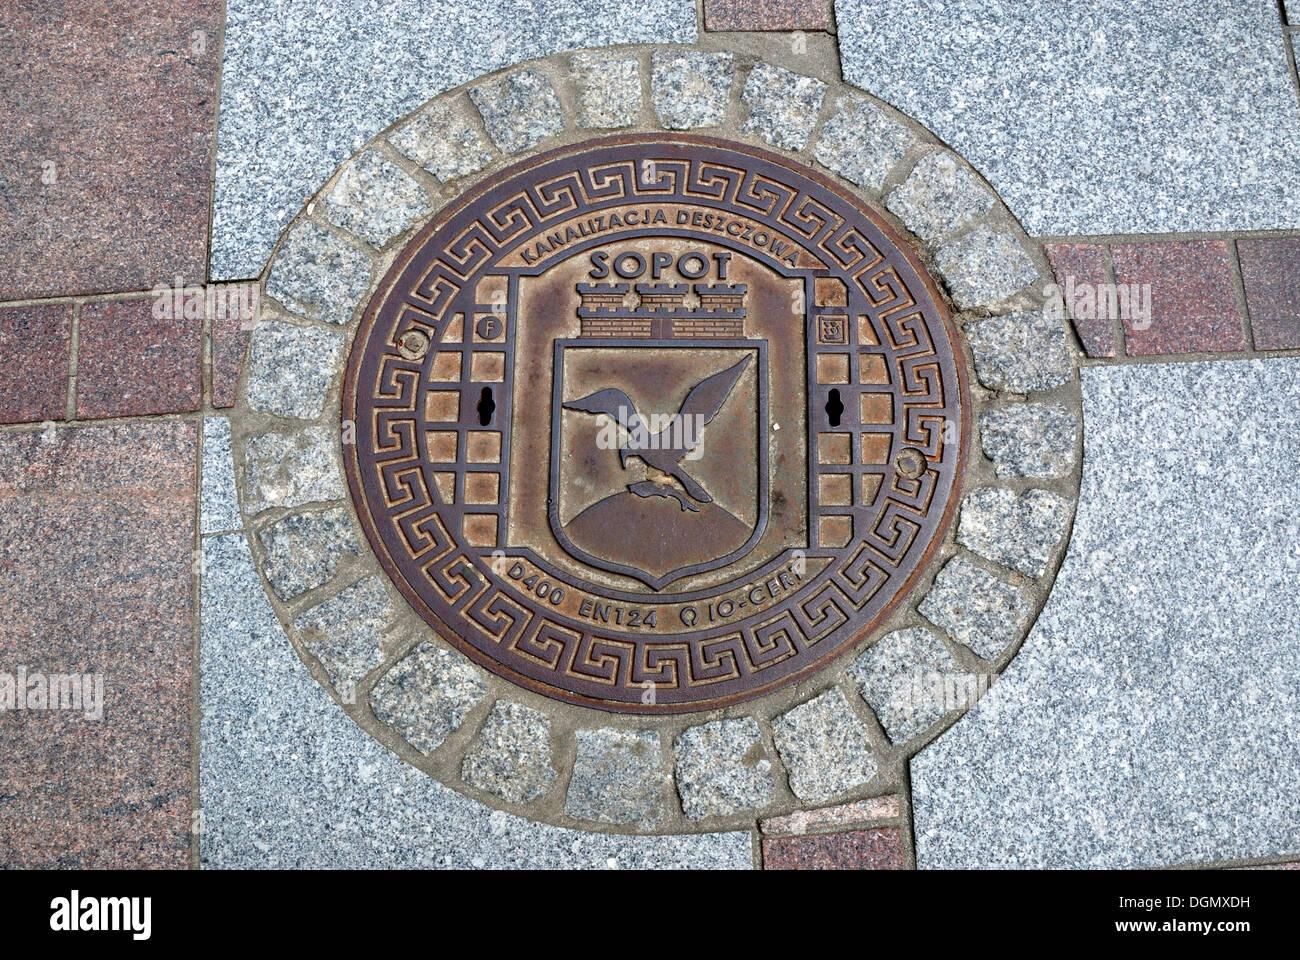 Manhole cover on the promenade of Sopot. - Stock Image